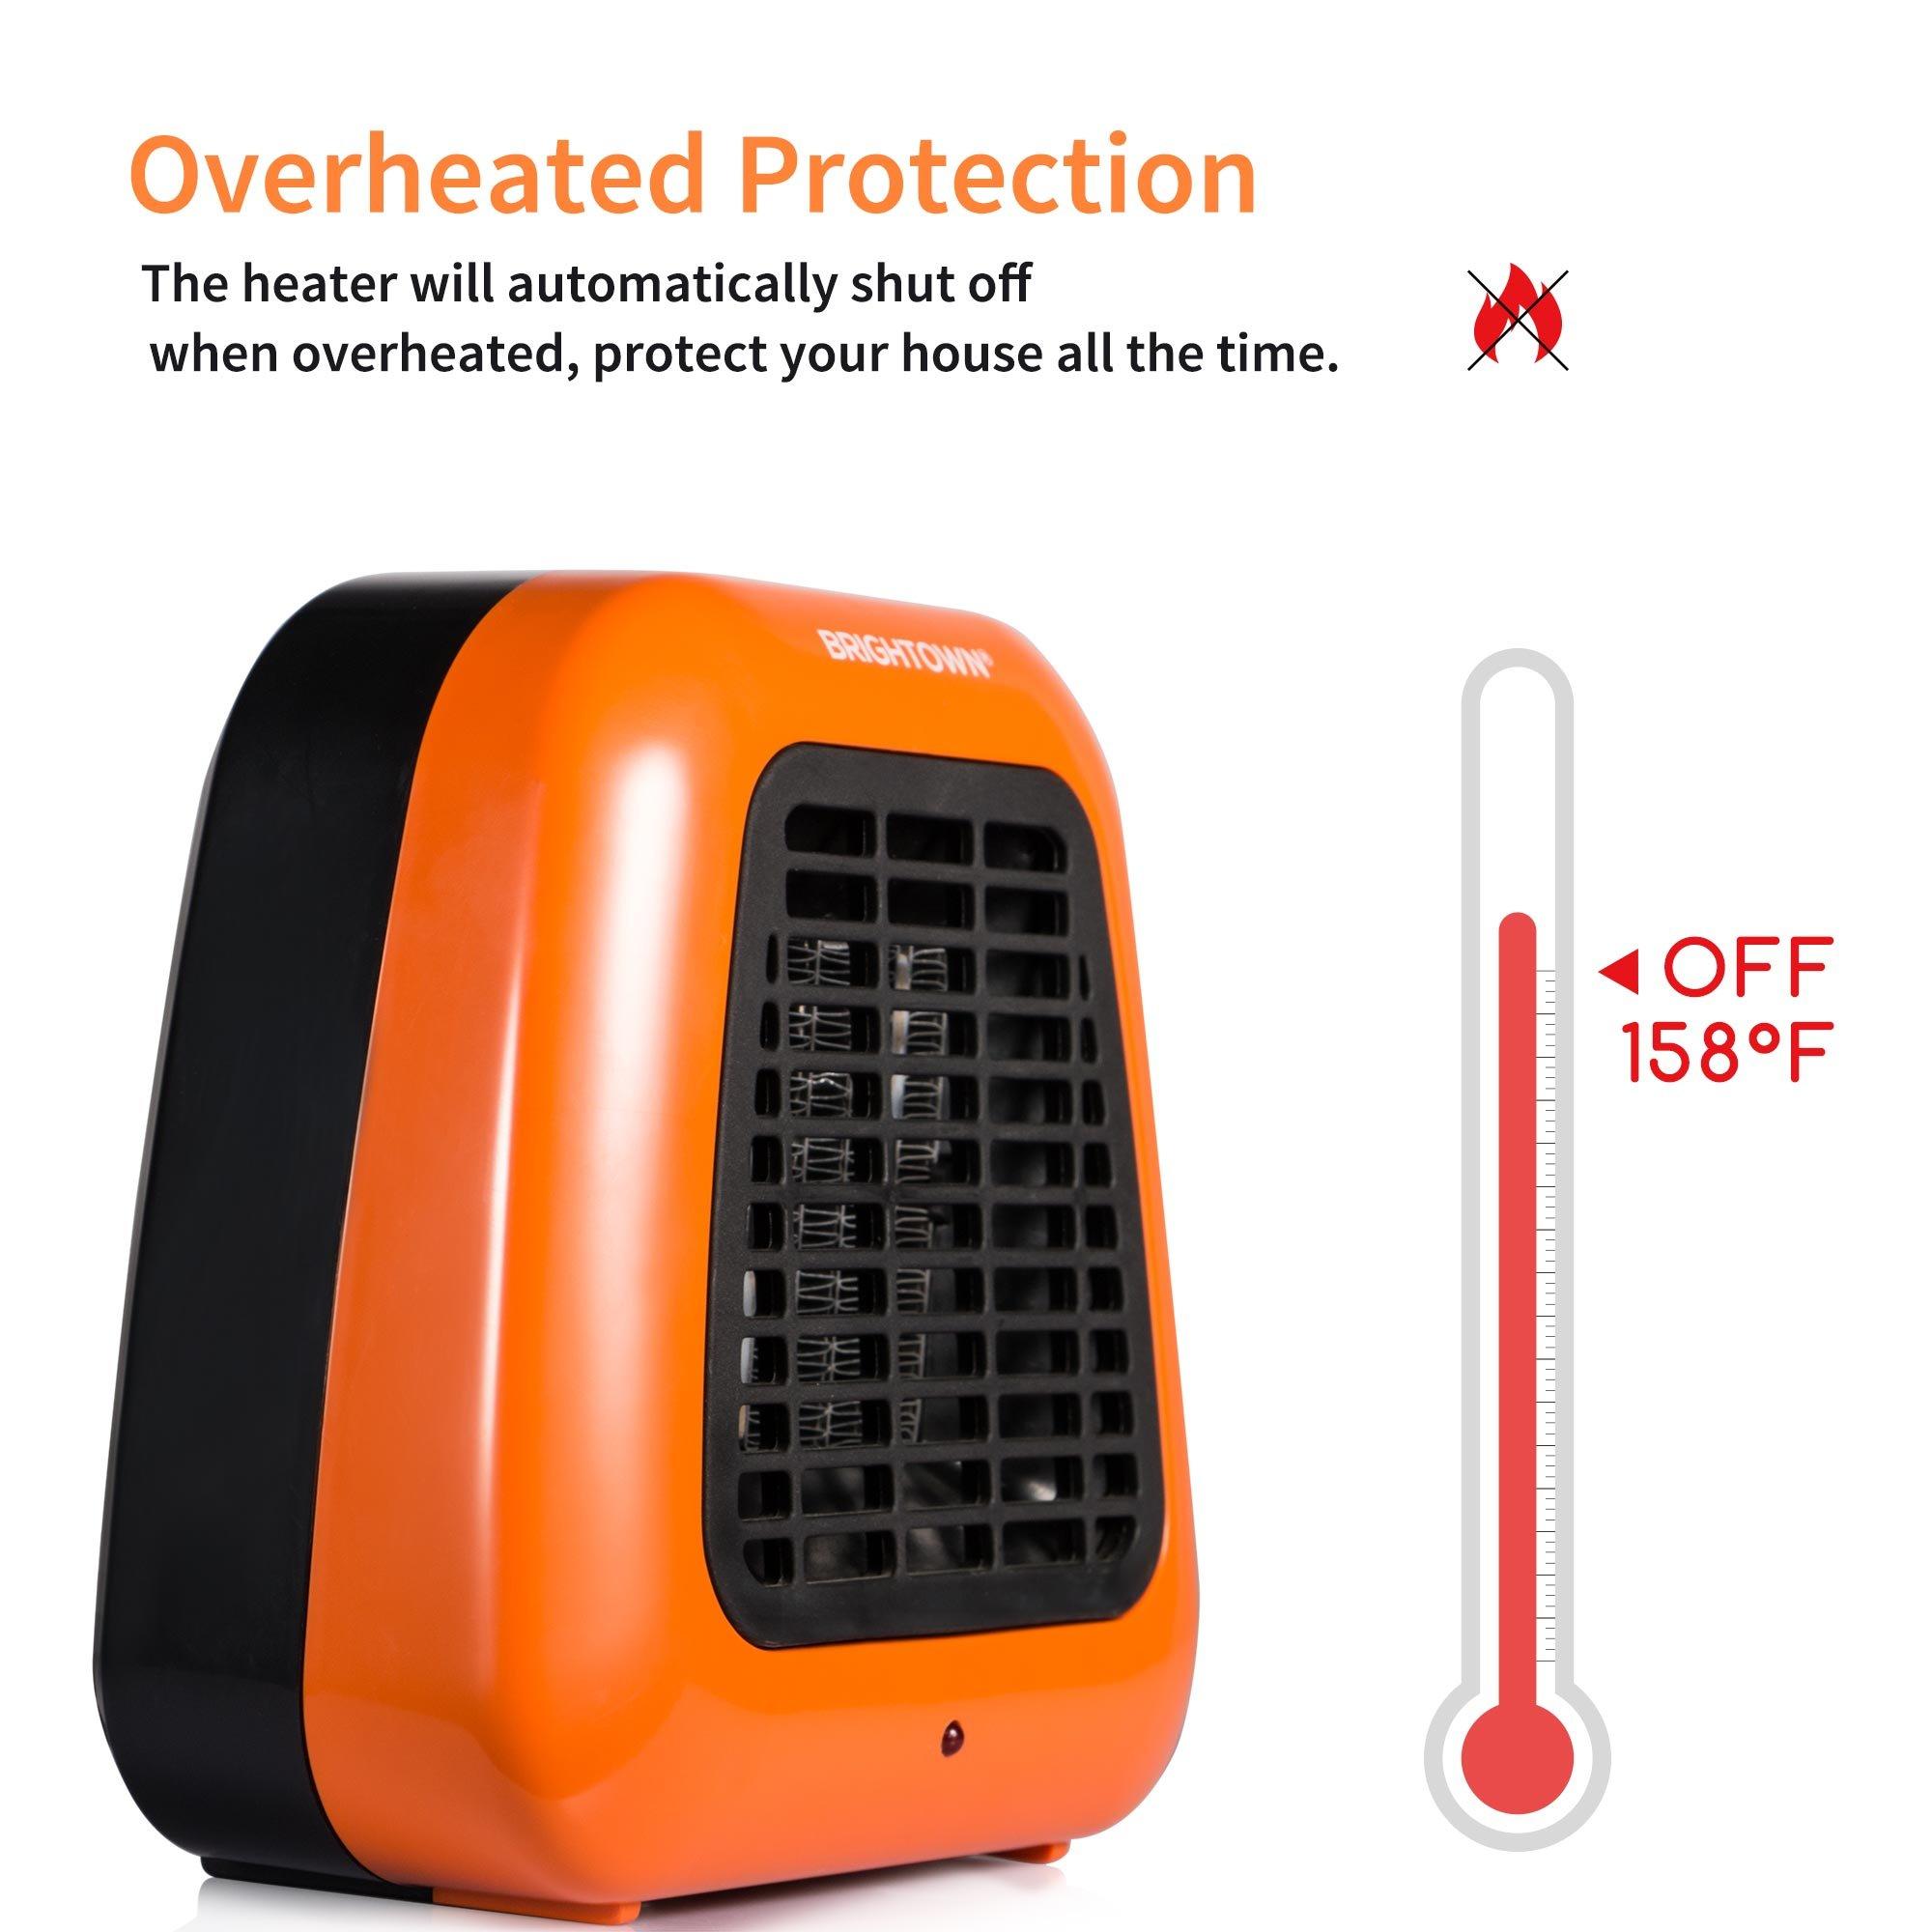 Personal Ceramic Portable-Mini Heater for Office Desktop Table Home Dorm, 400-Watt ETL Listed for Safe Use, Orange by Brightown (Image #5)